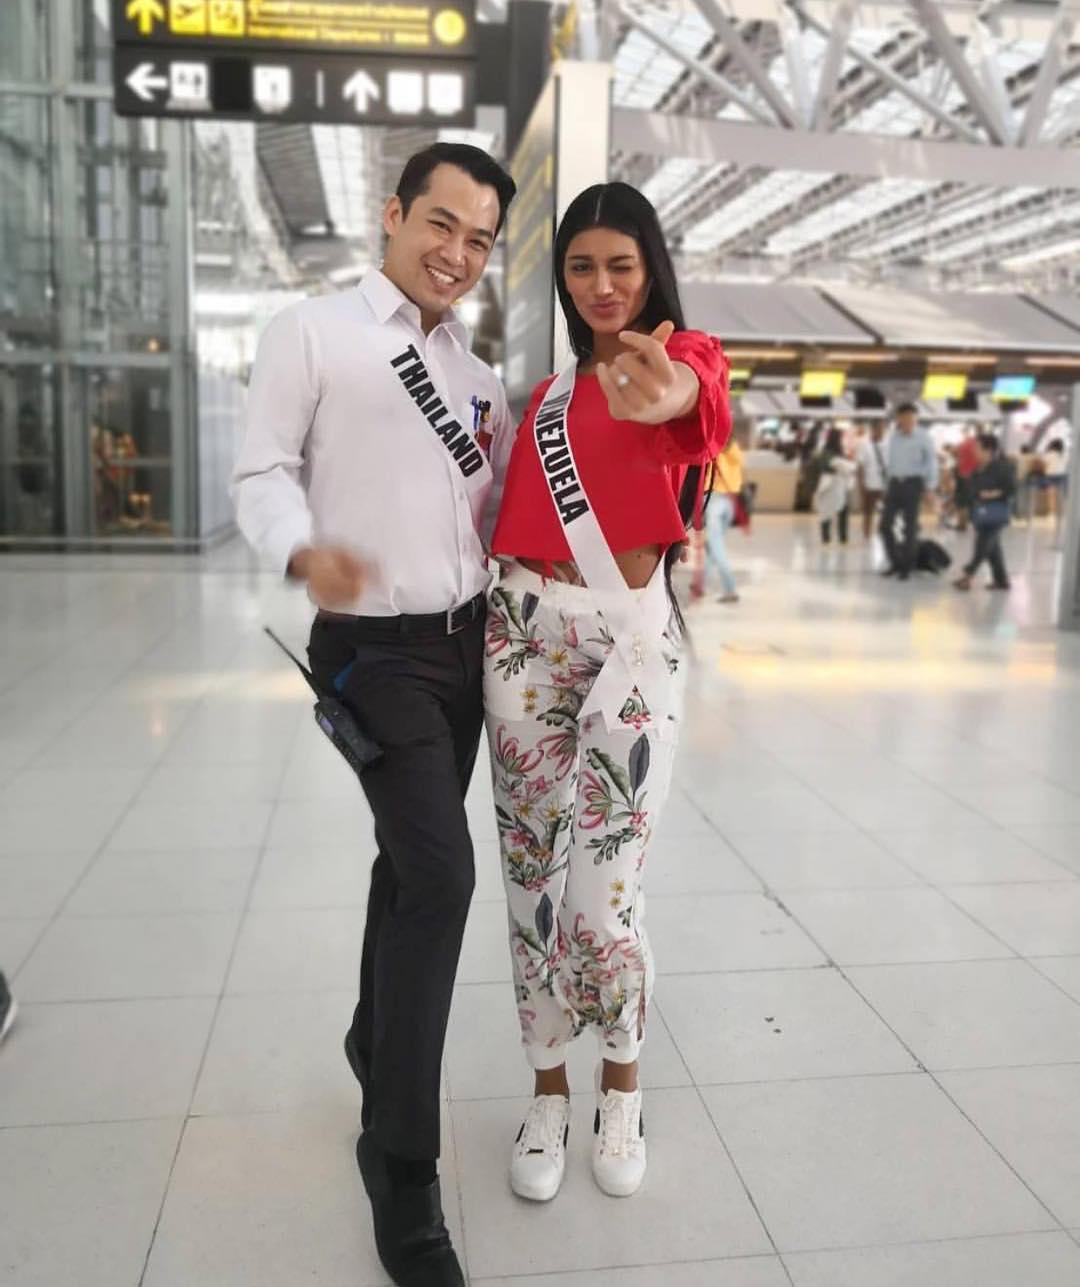 sthefany gutierrez, top 3 de miss universe 2018. - Página 24 Pbr2ip10